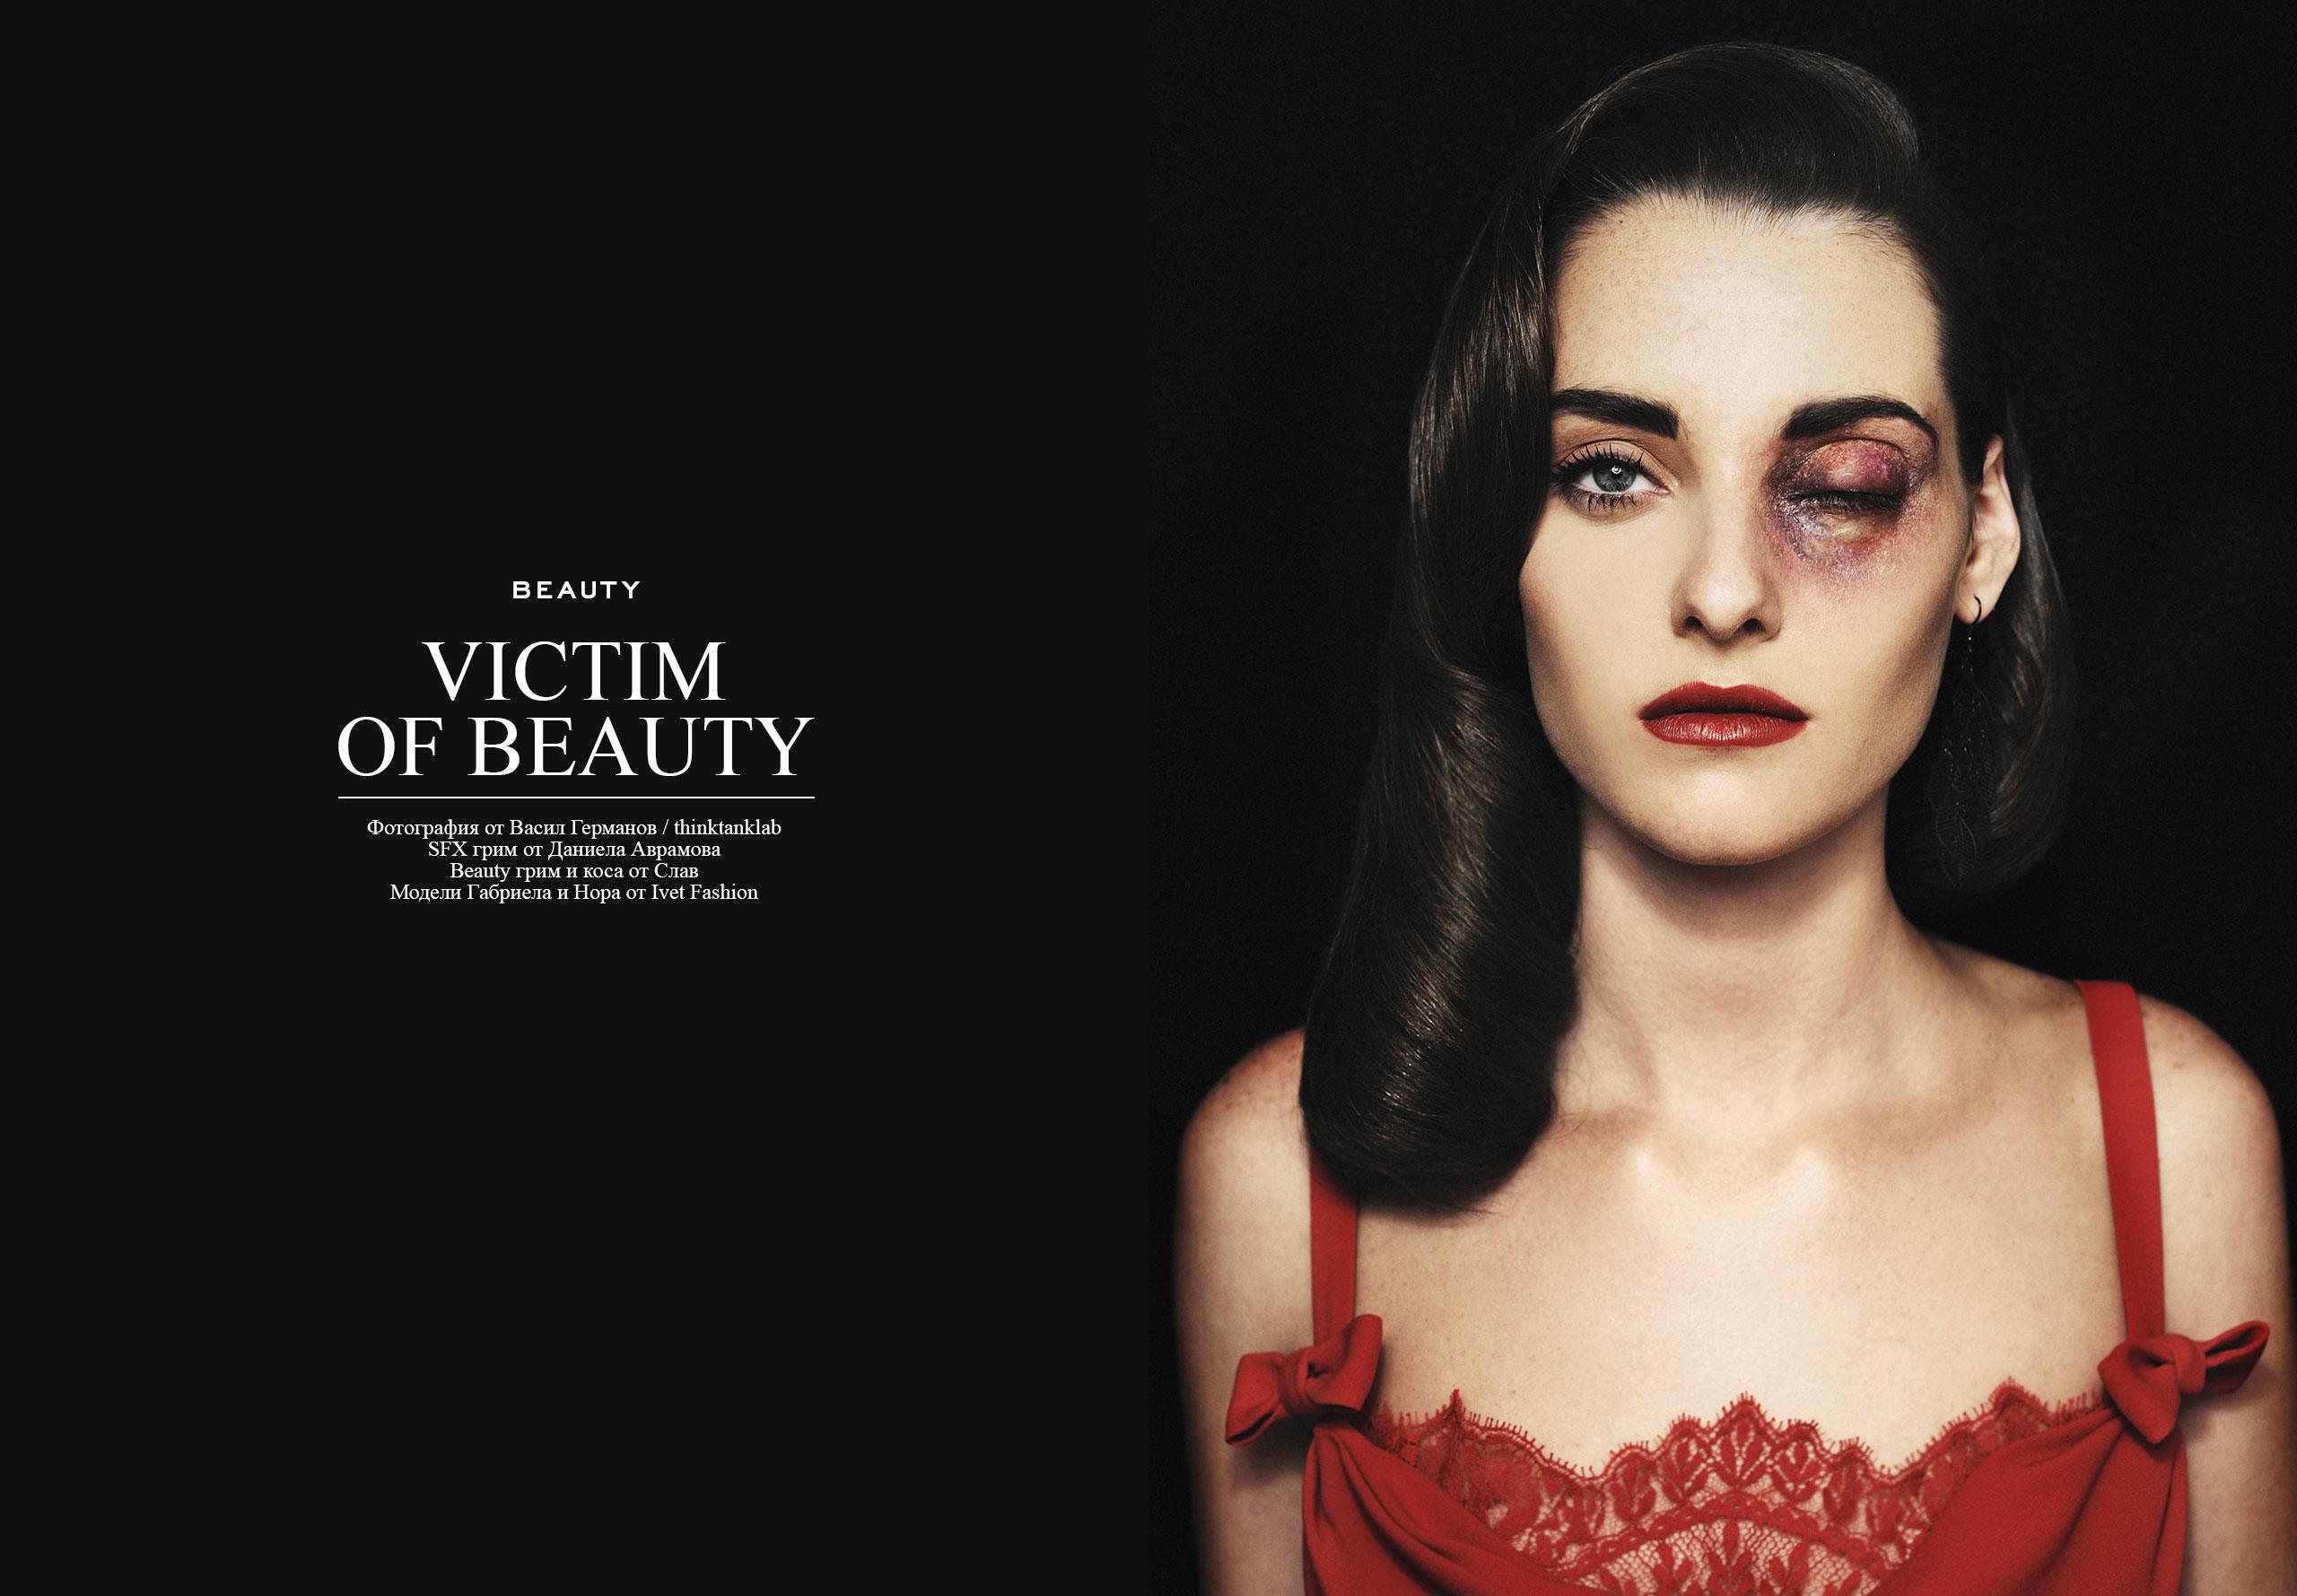 media texts victim of beauty waverley97